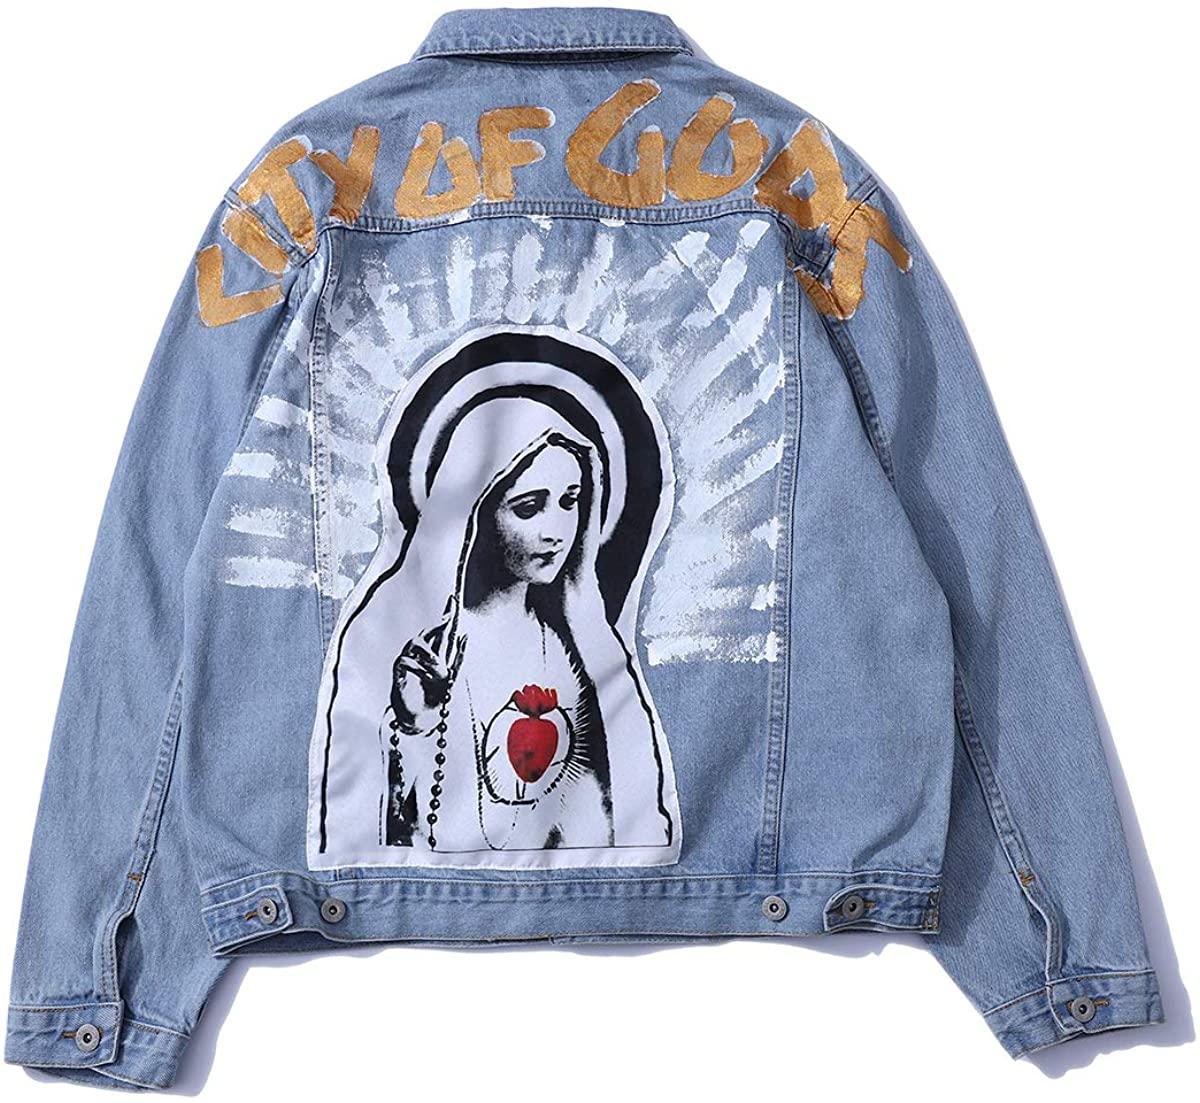 Lity Of Gog Denim Jacket Graphic Print Washed Jacket Hip Pop Button Down Trucker Jacket